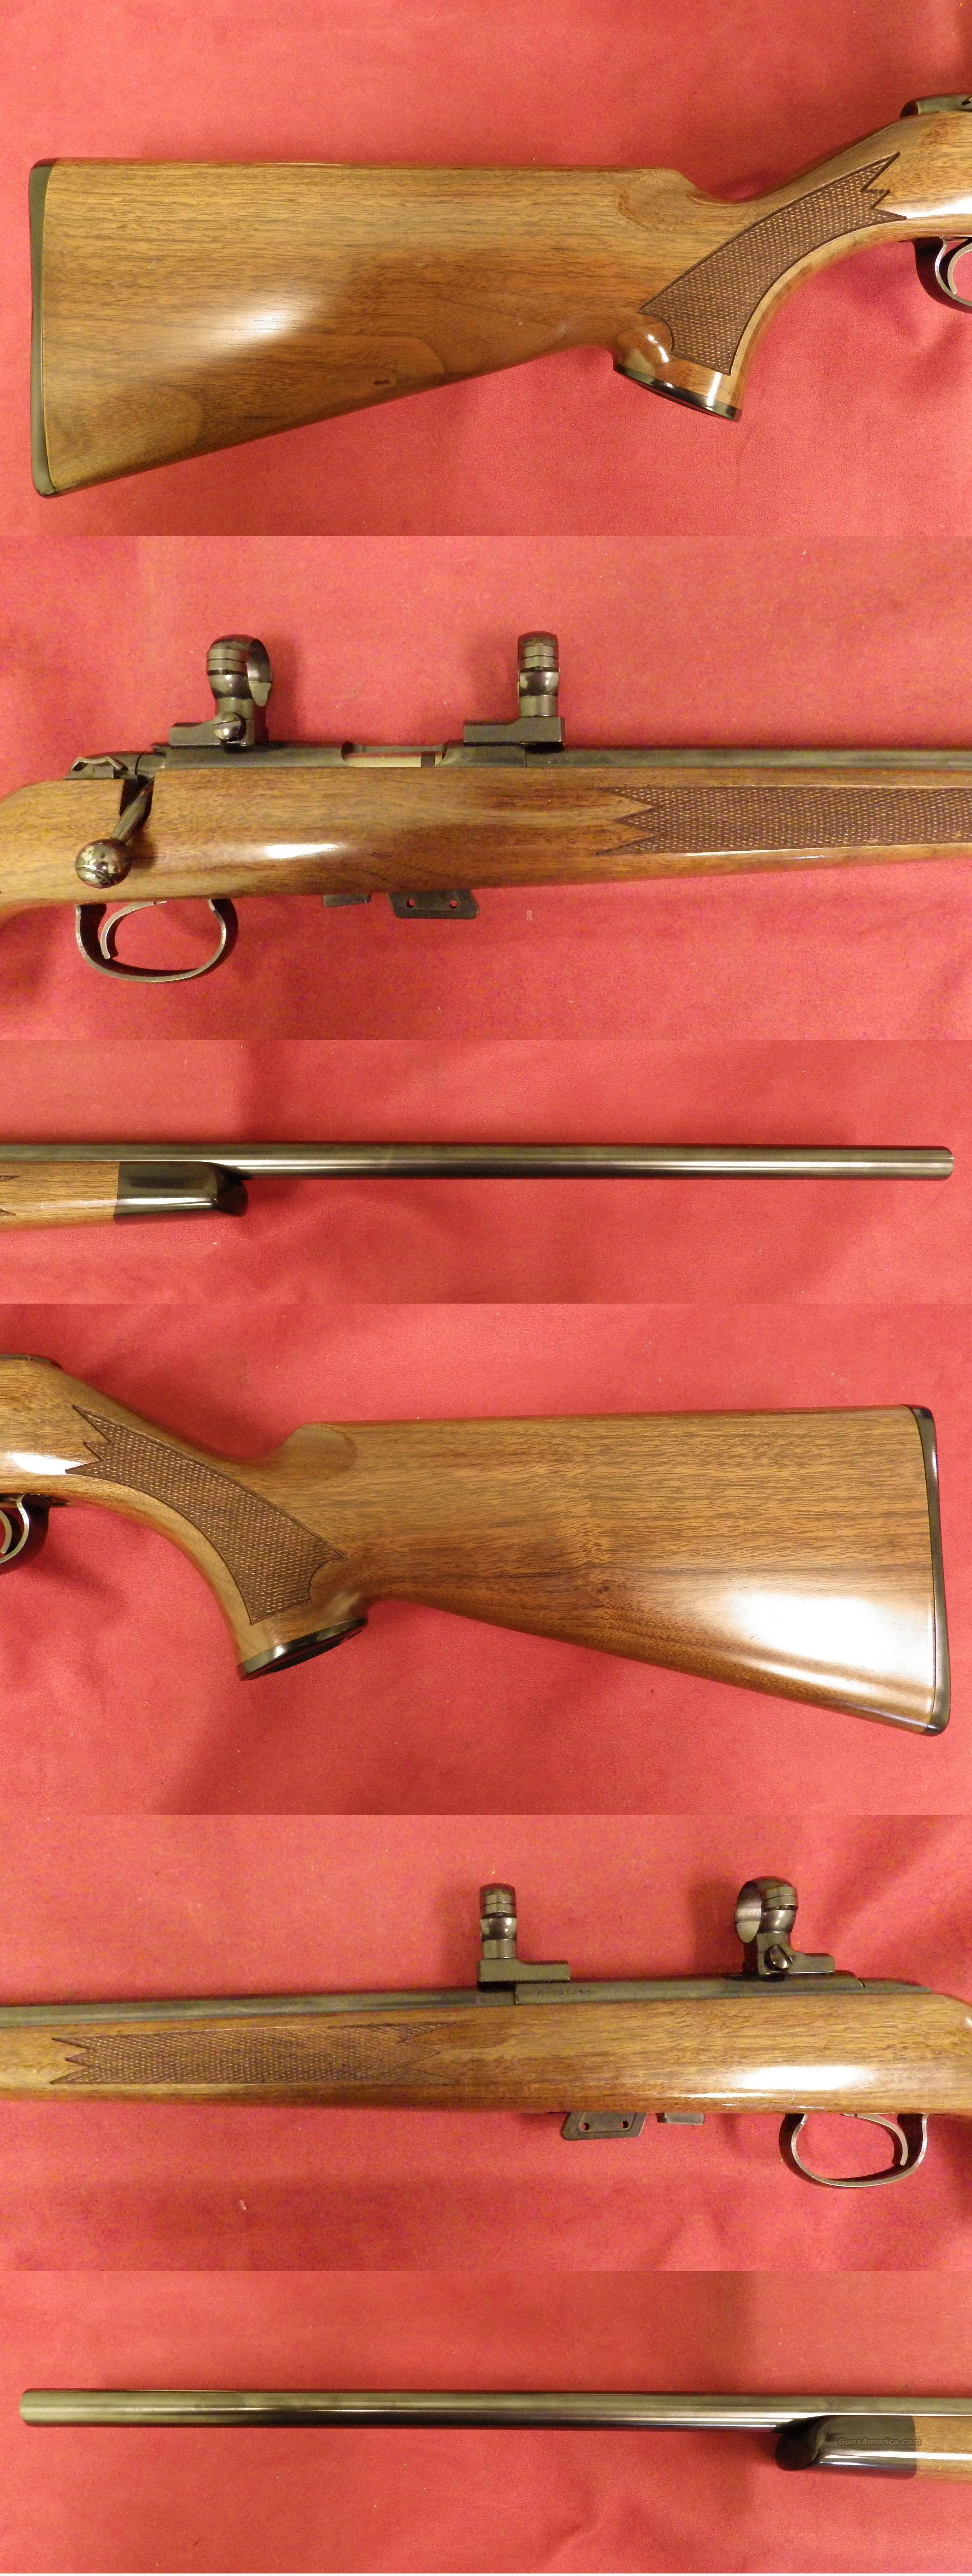 Remington 541-T .22 Cal.  *MUST CALL*  Guns > Rifles > Remington Rifles - Modern > .22 Rimfire Models